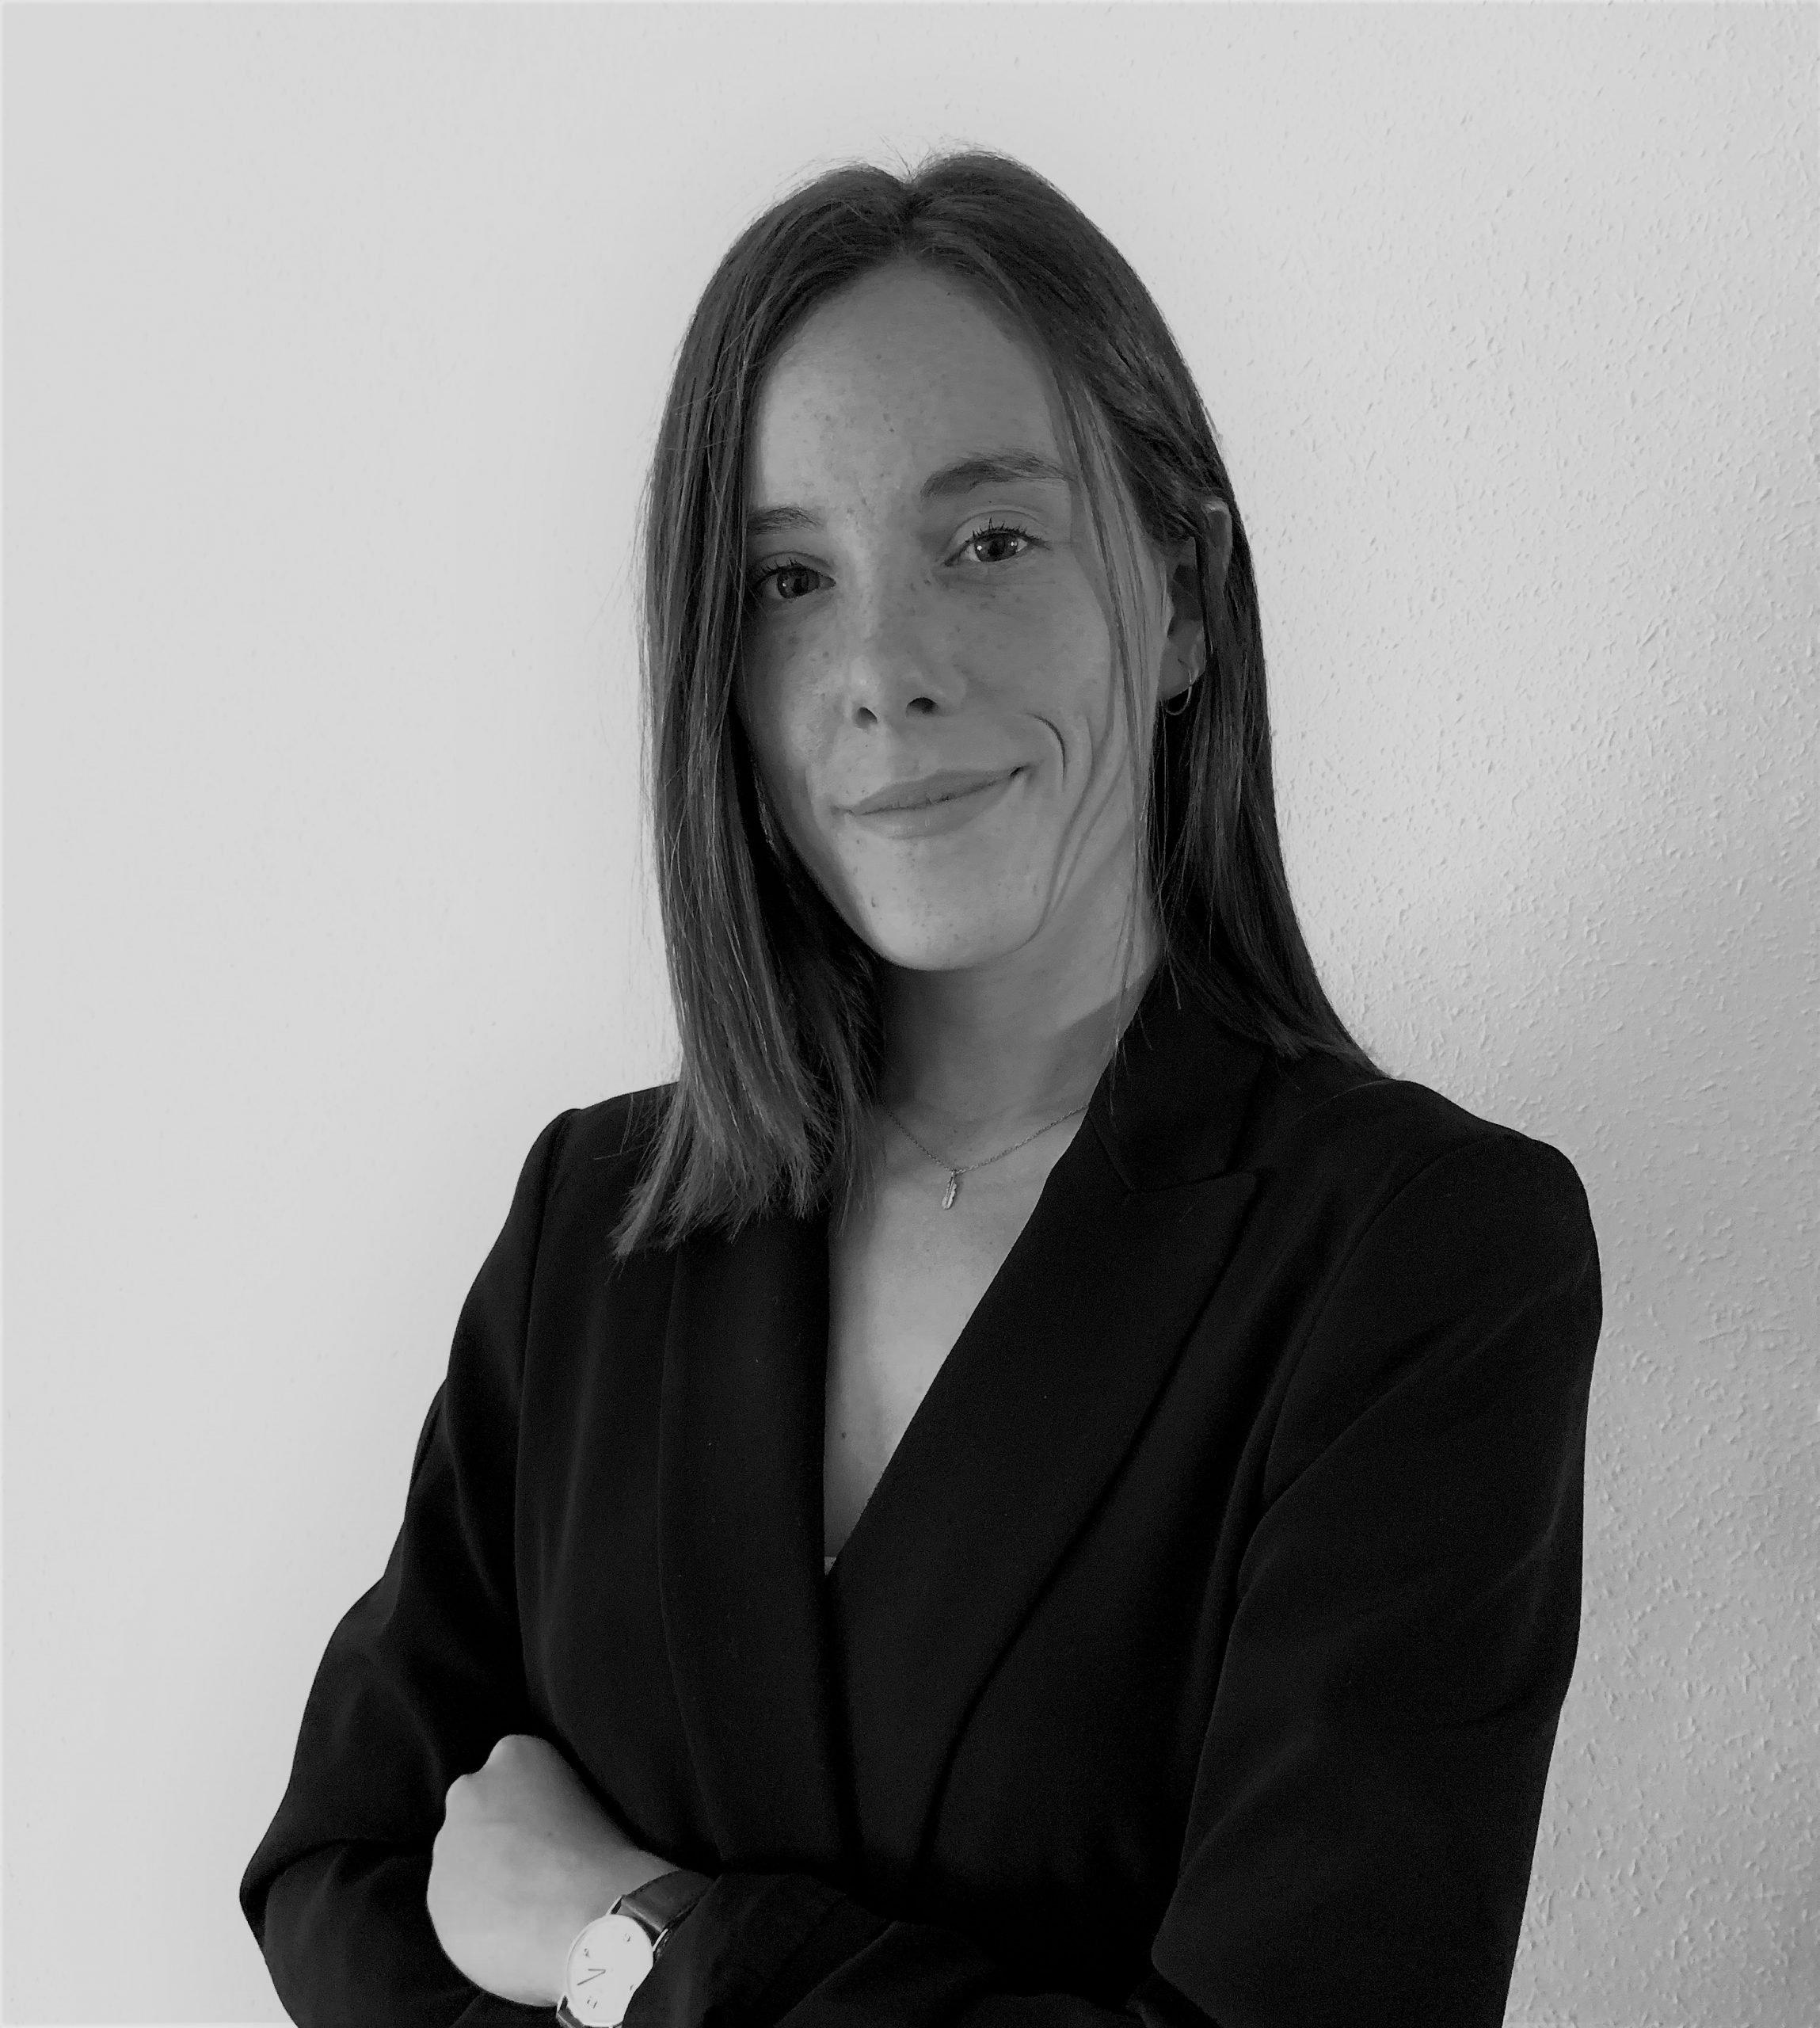 Sara Madrigal